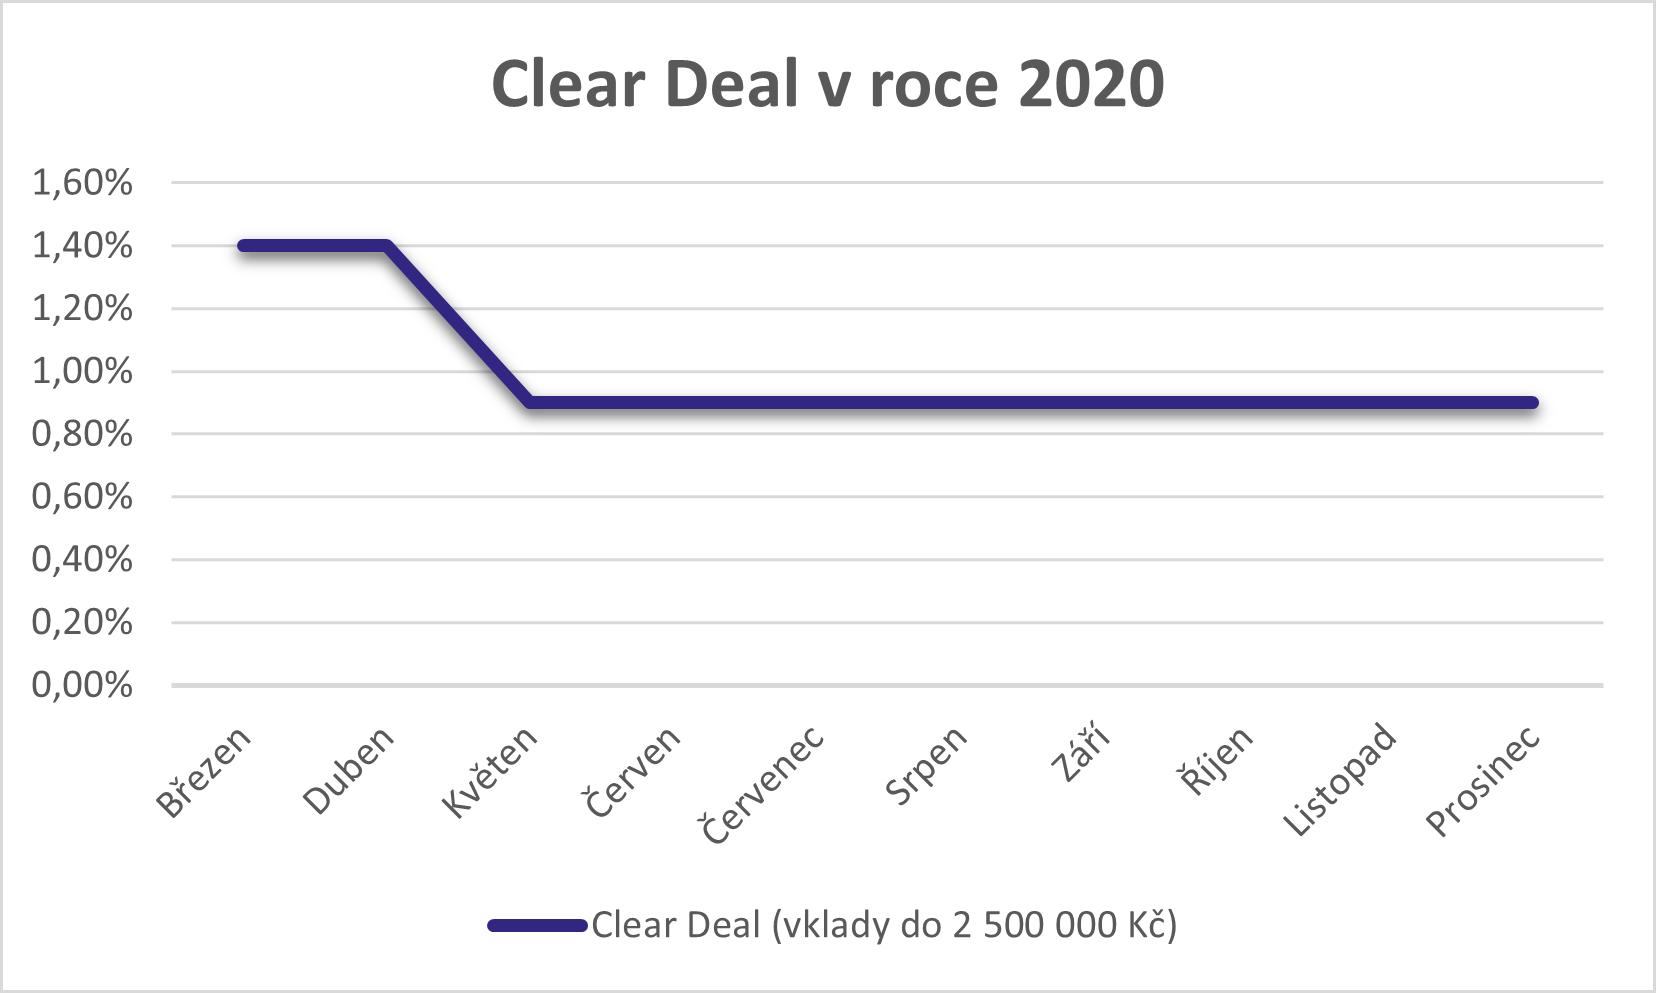 Clear deal 2020